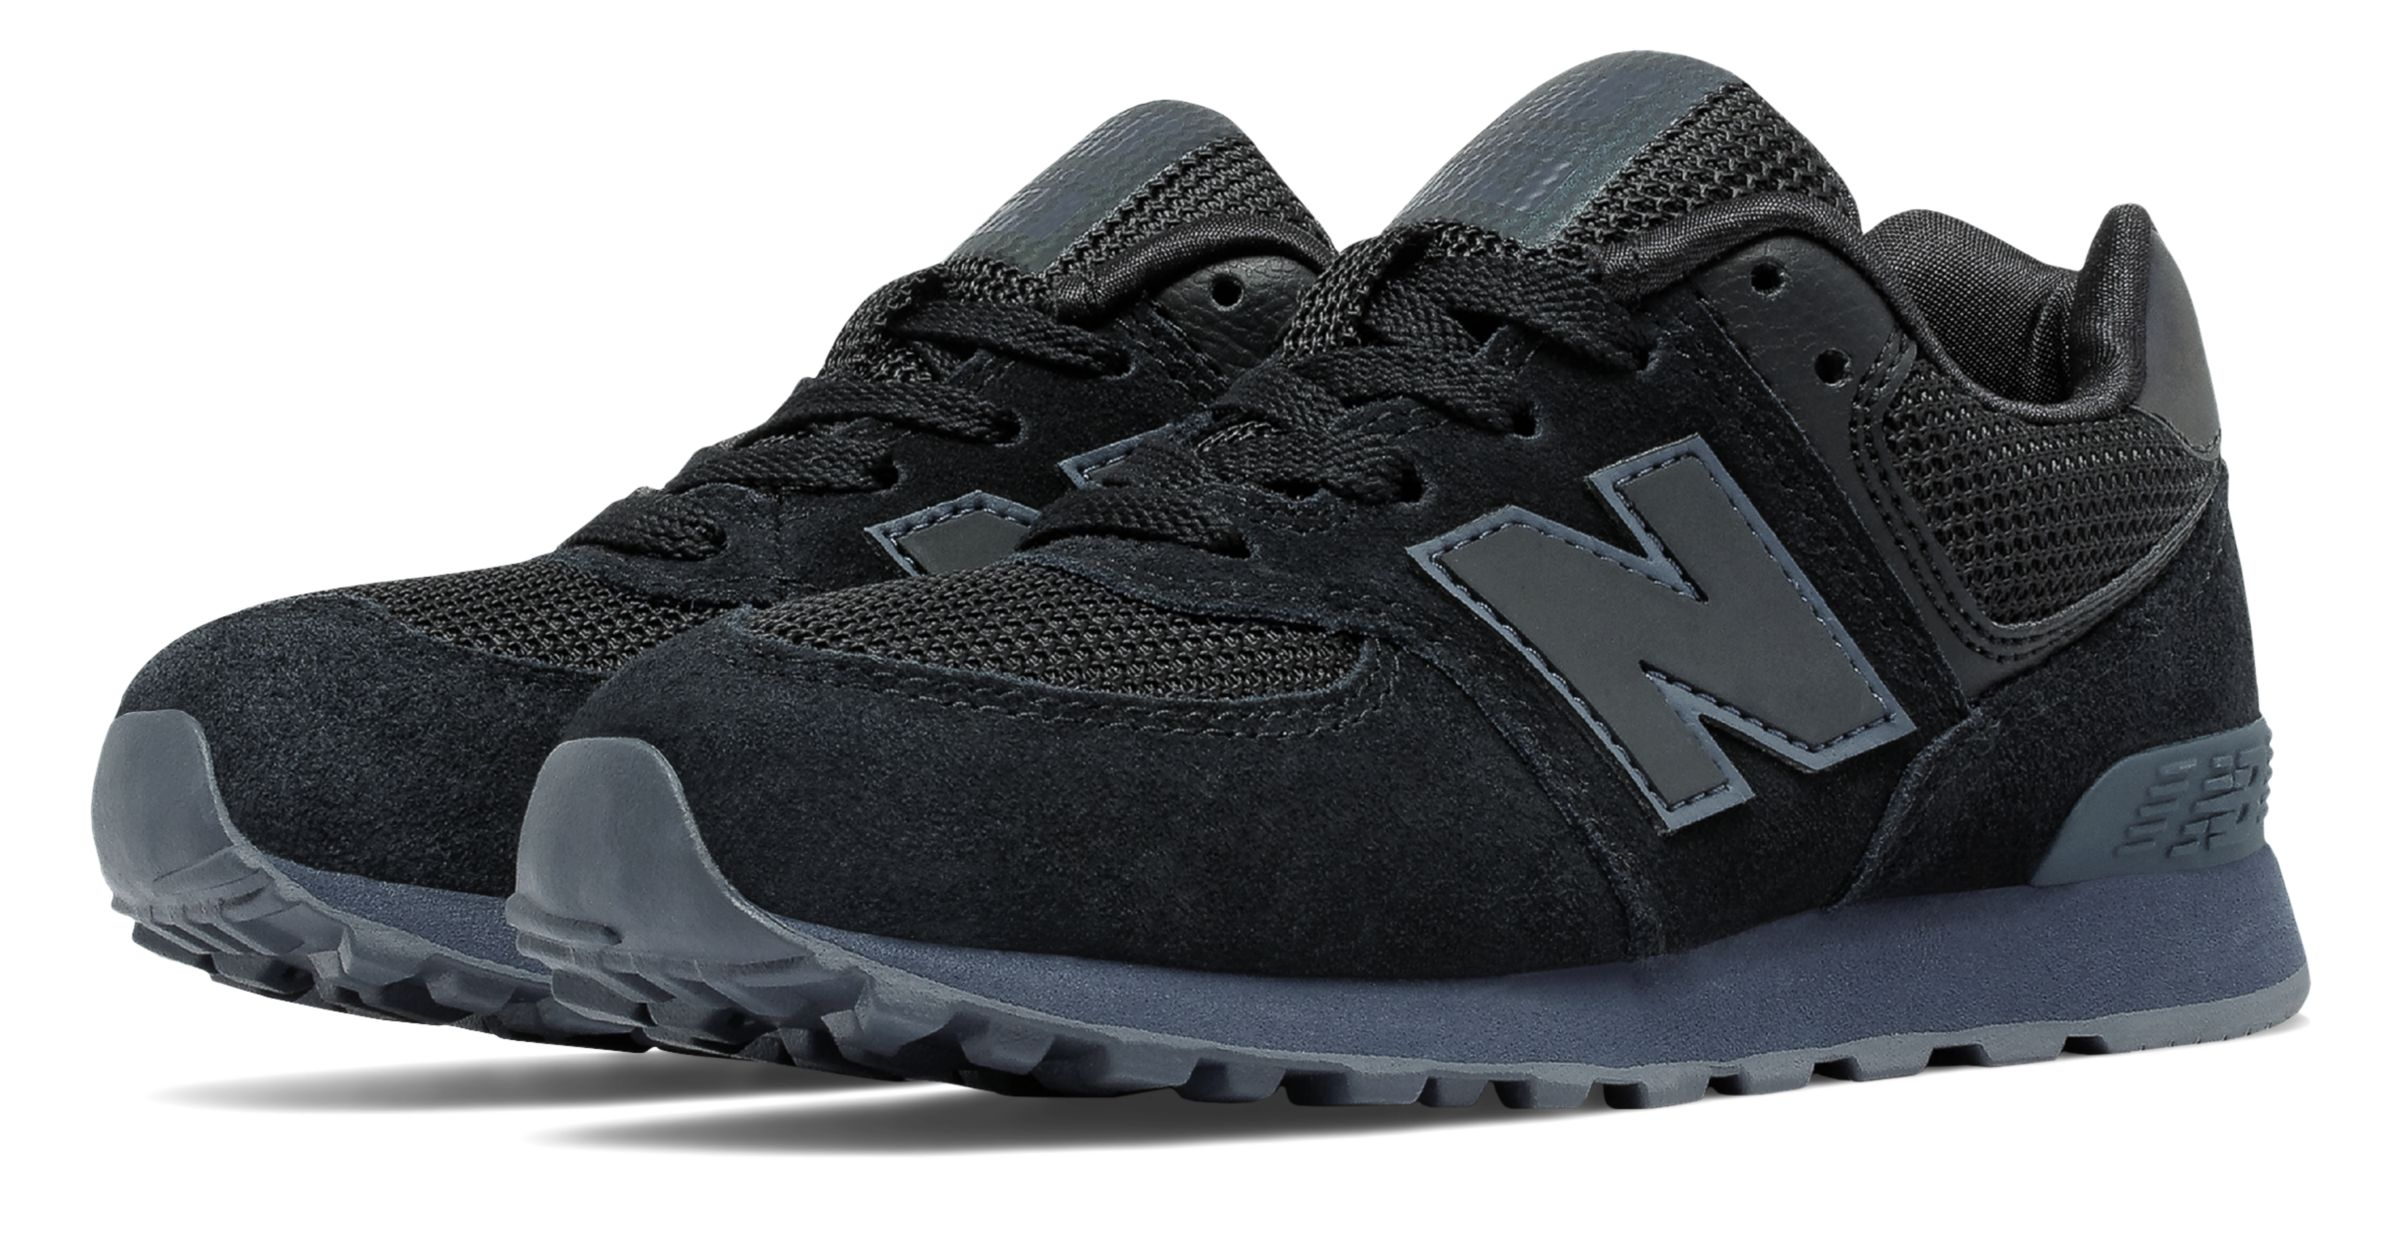 New Balance 574 Urban Twilight Pre - school Boys Shoes Black